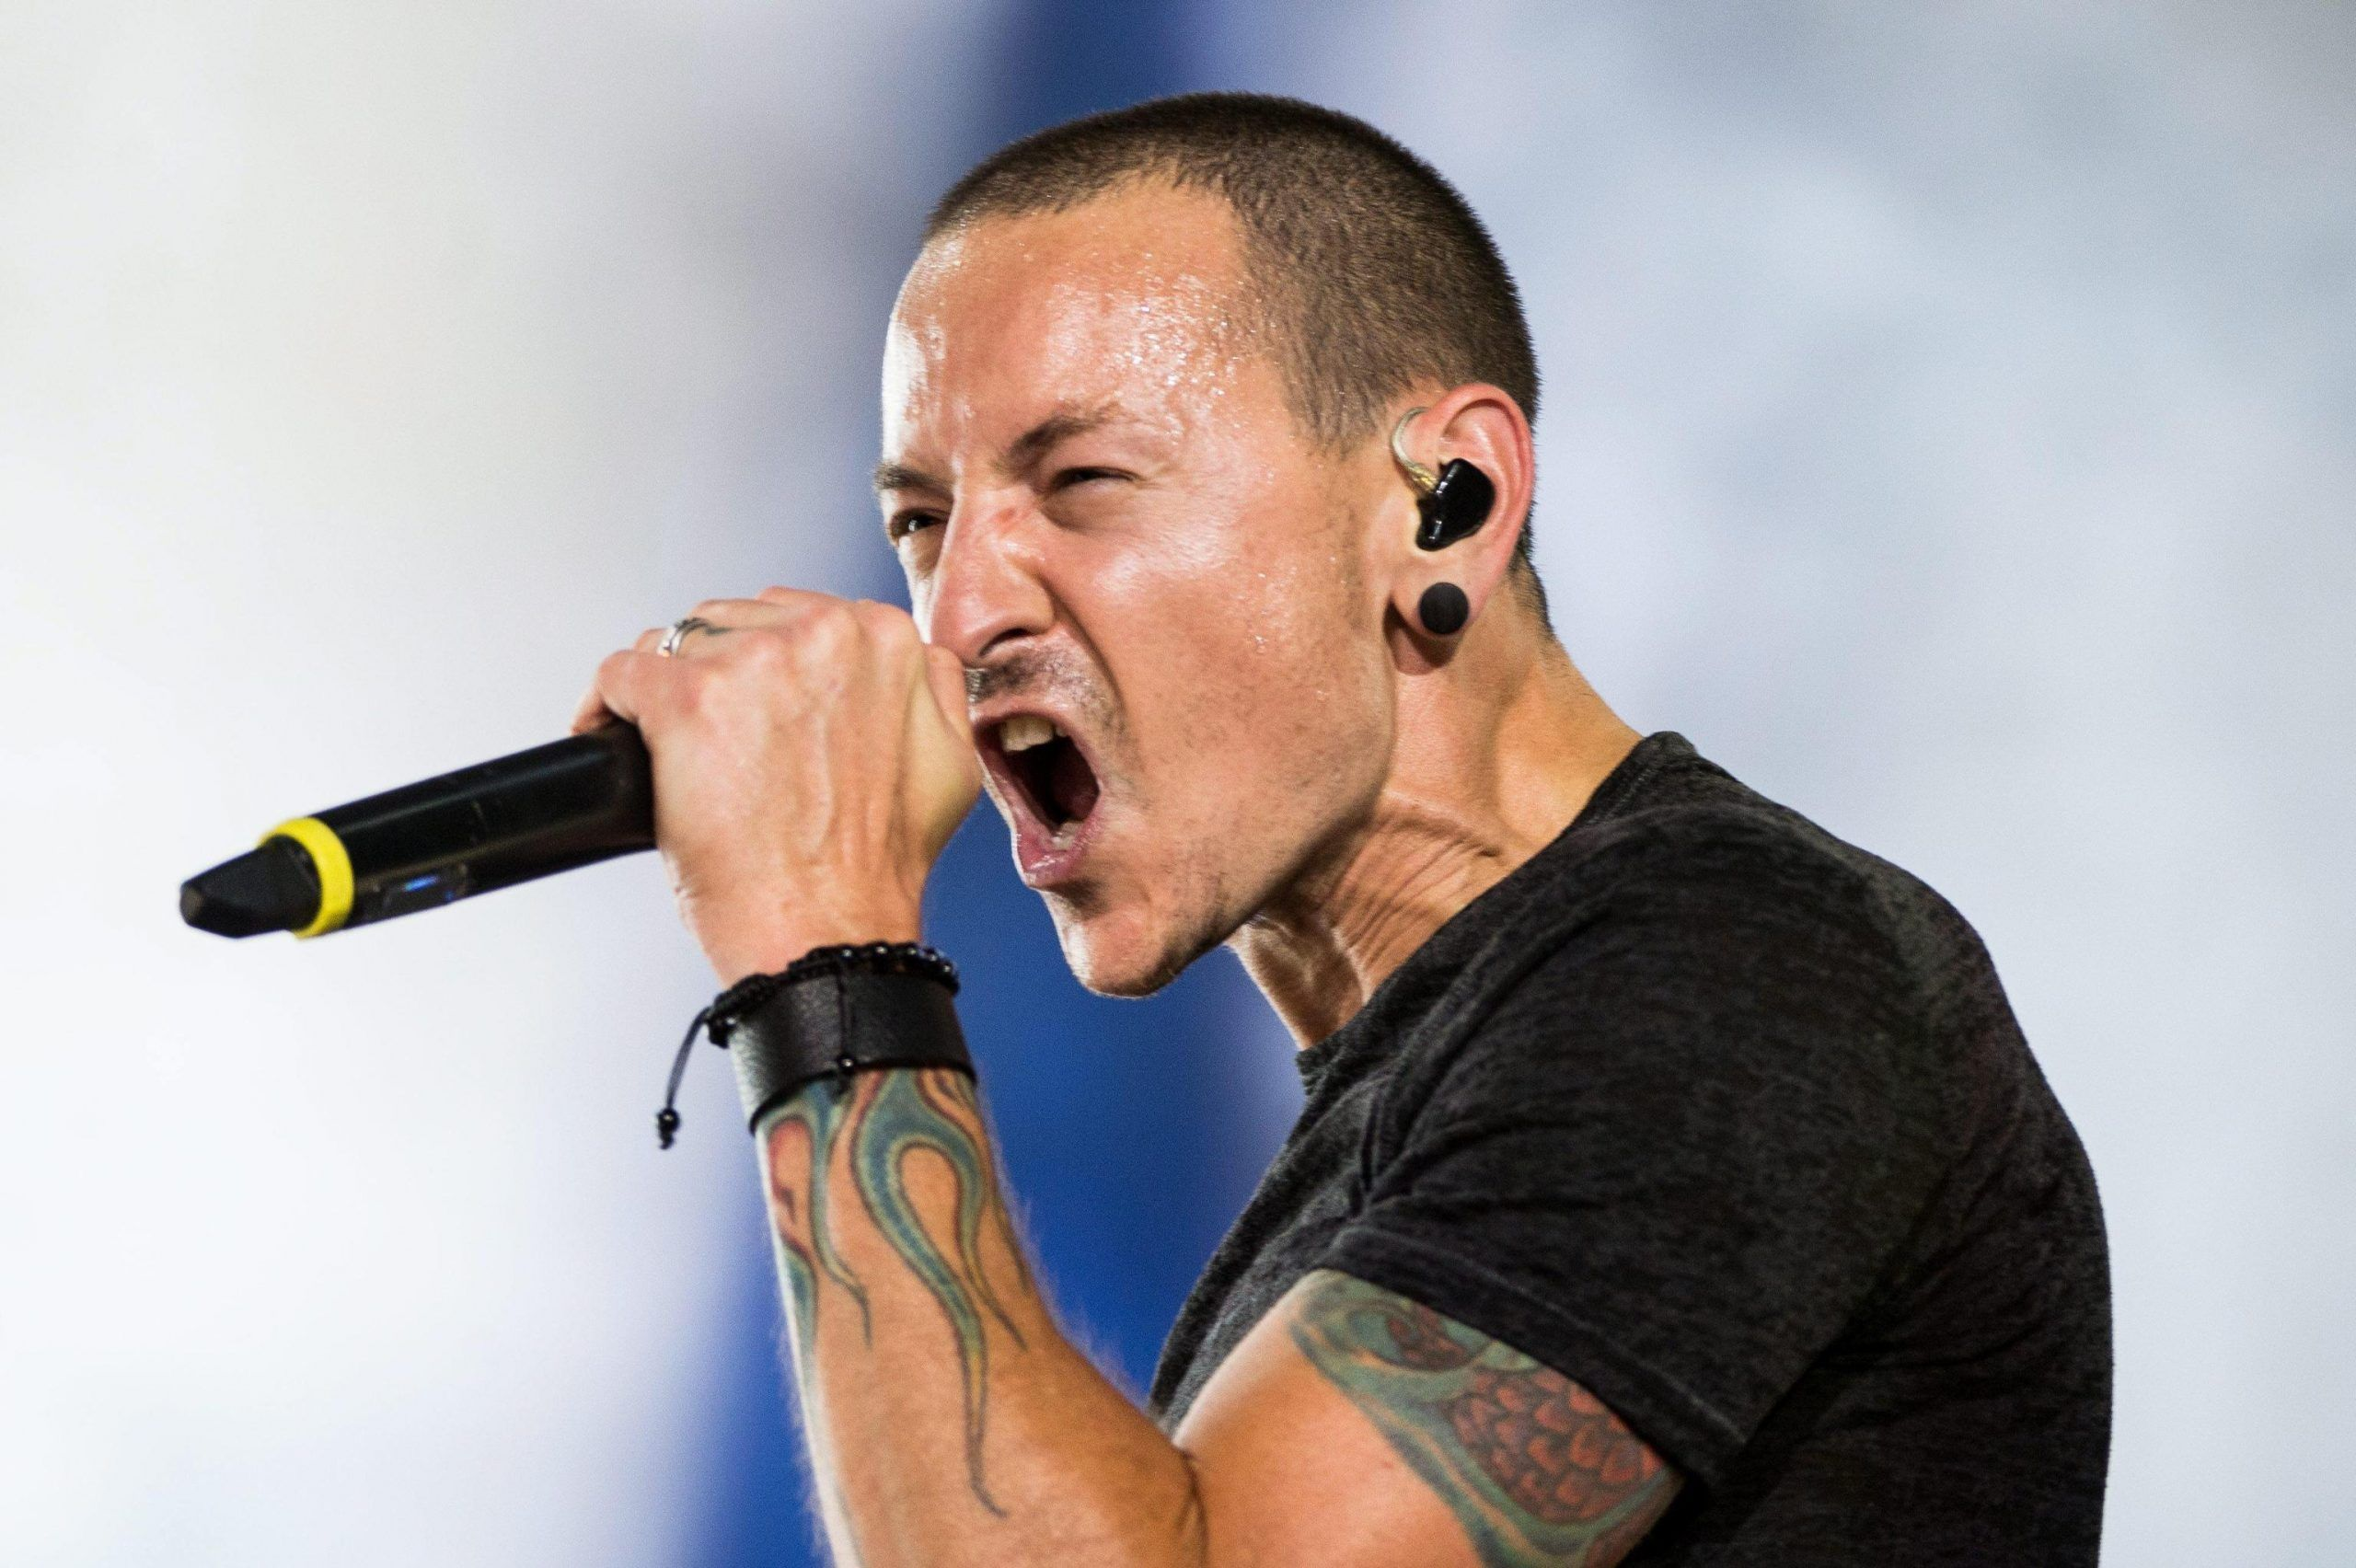 Morto Chester Bennington Linkin Park